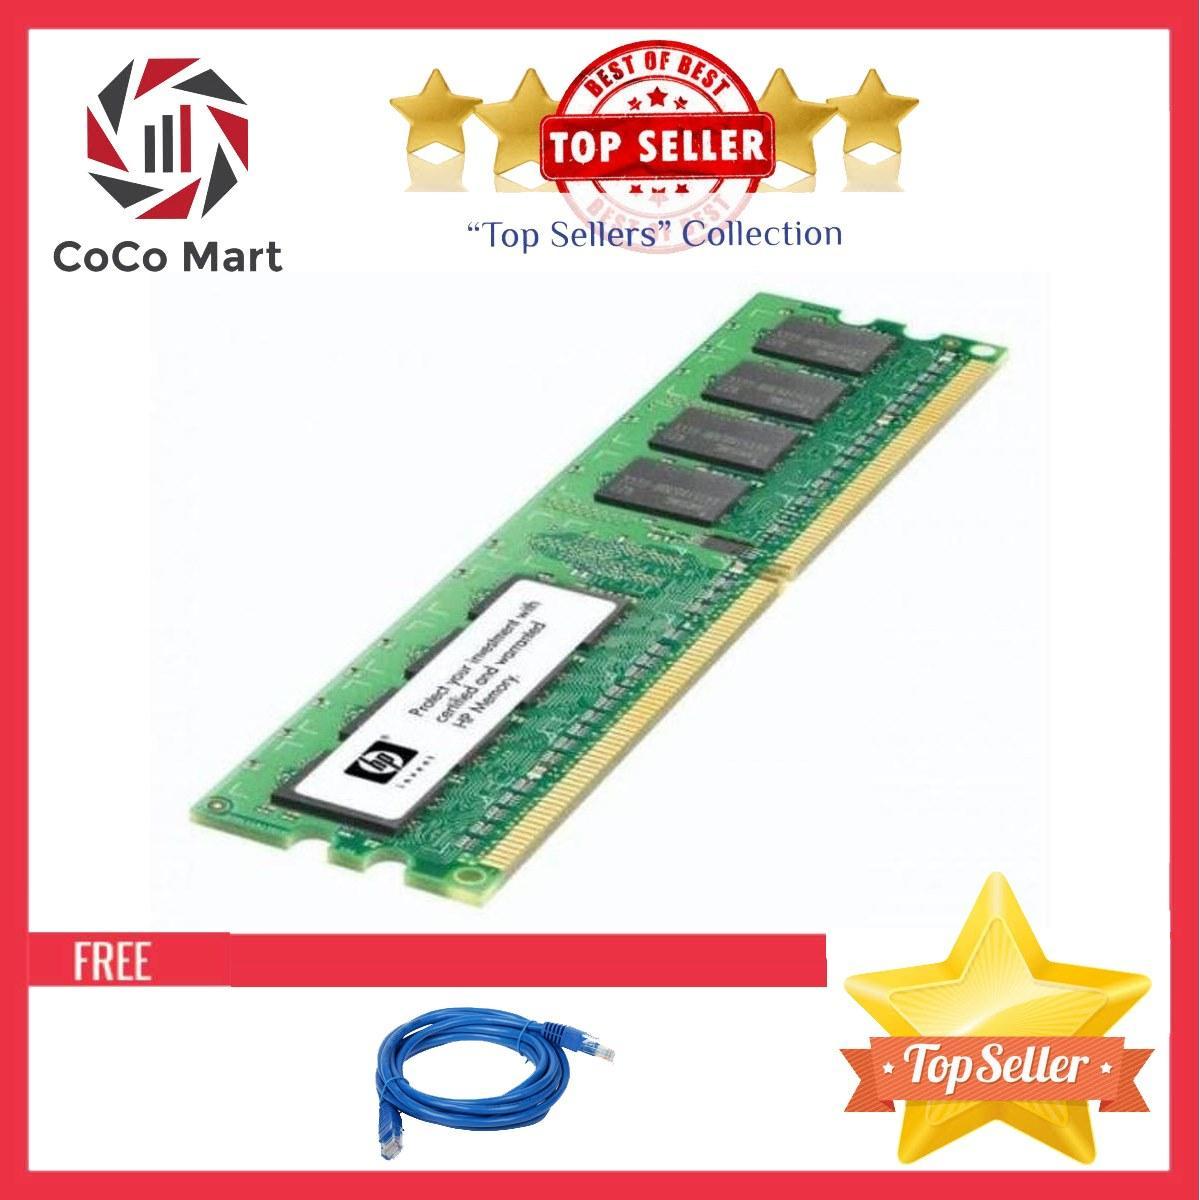 Ram ECC Máy Trạm HP 8GB, DDR 3, Bus 1600Mhz Siêu Bền